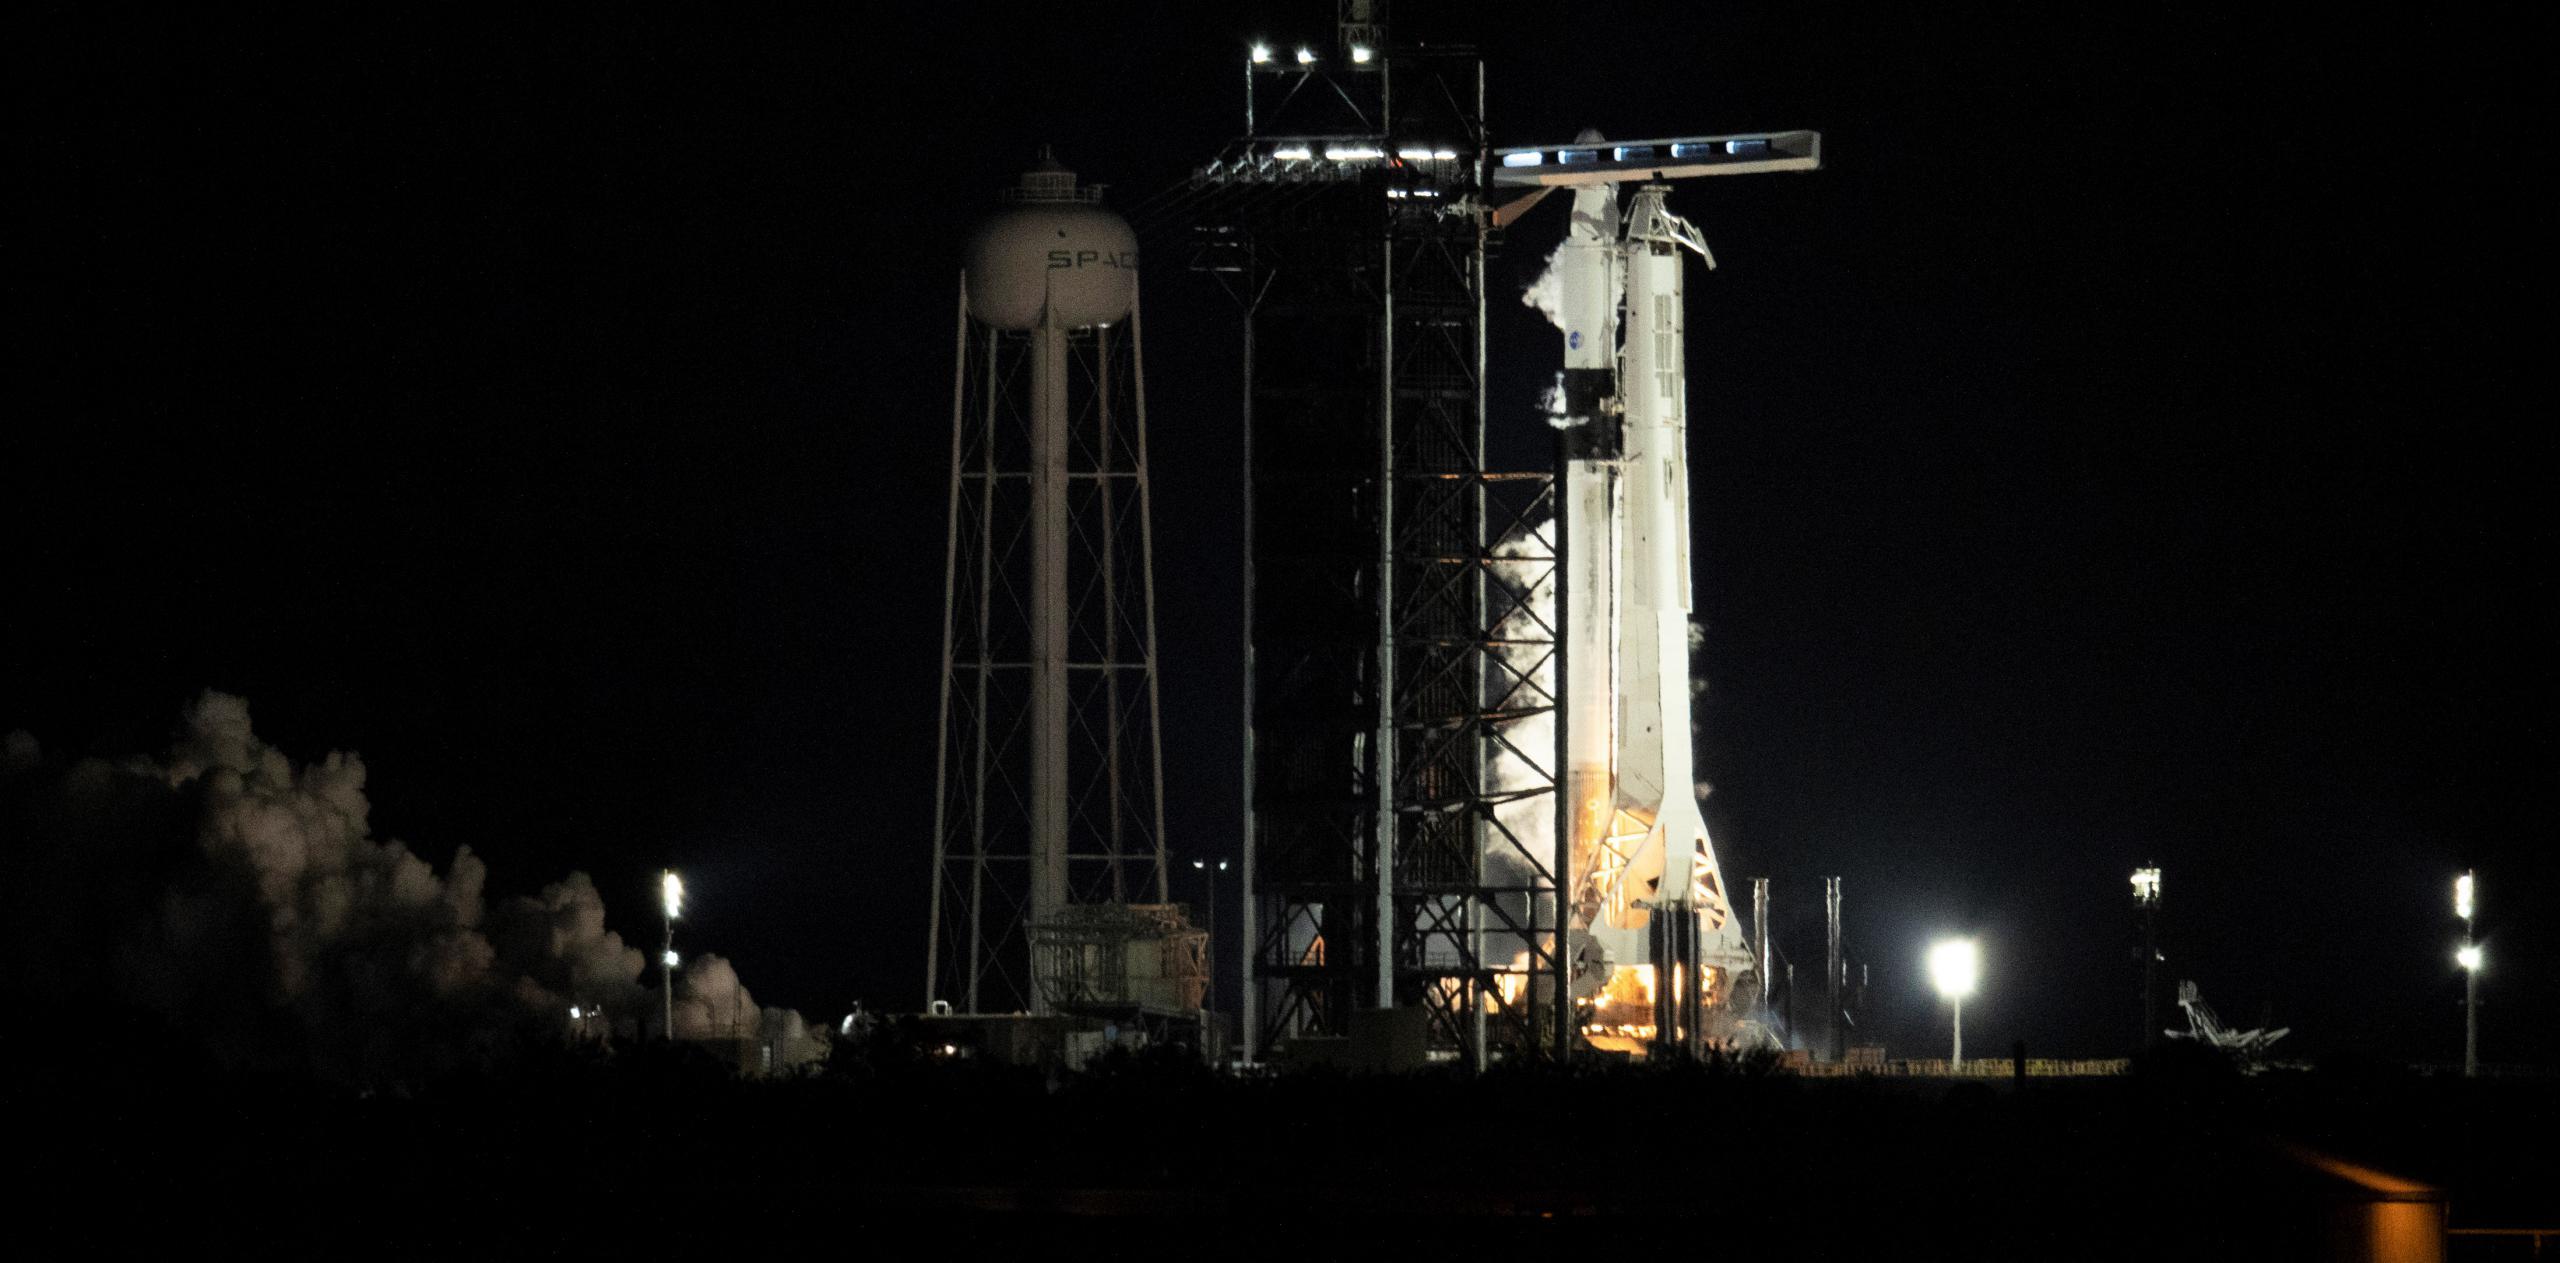 Crew-2 Crew Dragon C206 Falcon 9 B1061 39A 041721 (NASA) static fire 2 crop (c)